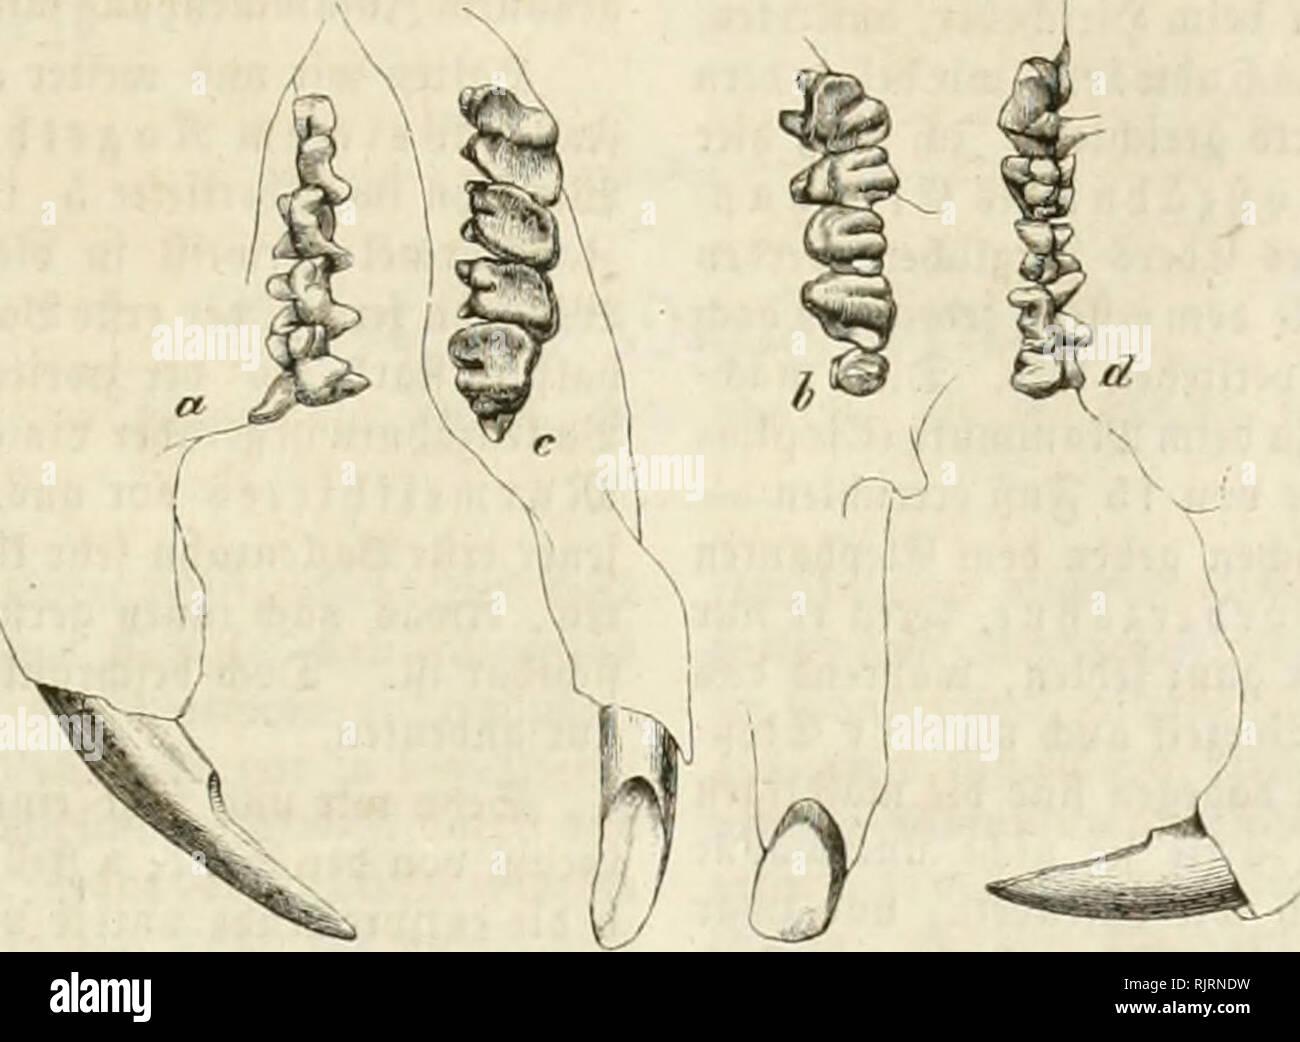 ". Aus der Heimath. Natural history; Natural history -- Germany. 489 490 um e8 bir ftar ju ma^en, tcic toicfctig bic Äcnntni§ bei"" 3ä^nc bem 300'ogcn tji!? 9ßic fmb bie foffUcn atc^e ber %i)m( bcfd^affen? ©inb fte nid)t meift nur (^tagmente? ©erabc fo Vcic unä bic ^flanjen ber Xiorwett oft nur in einjelnen S8(ättern, ja — in 23(attnarbcn — in bcn Scbid^ten überliefert tocrbcn unb eö nun gilt auä bem njenigen 5.*orhanbenen atleä übrige 5'et)tenbe ju fonftruiren, fo ftnben »ir oft nur ben 3'^')"" — """"*> muffen unä ba8 ganje 511)ier baju benfen. ®e^en njir inbe§ no^ einen ©cf - Stock Image"